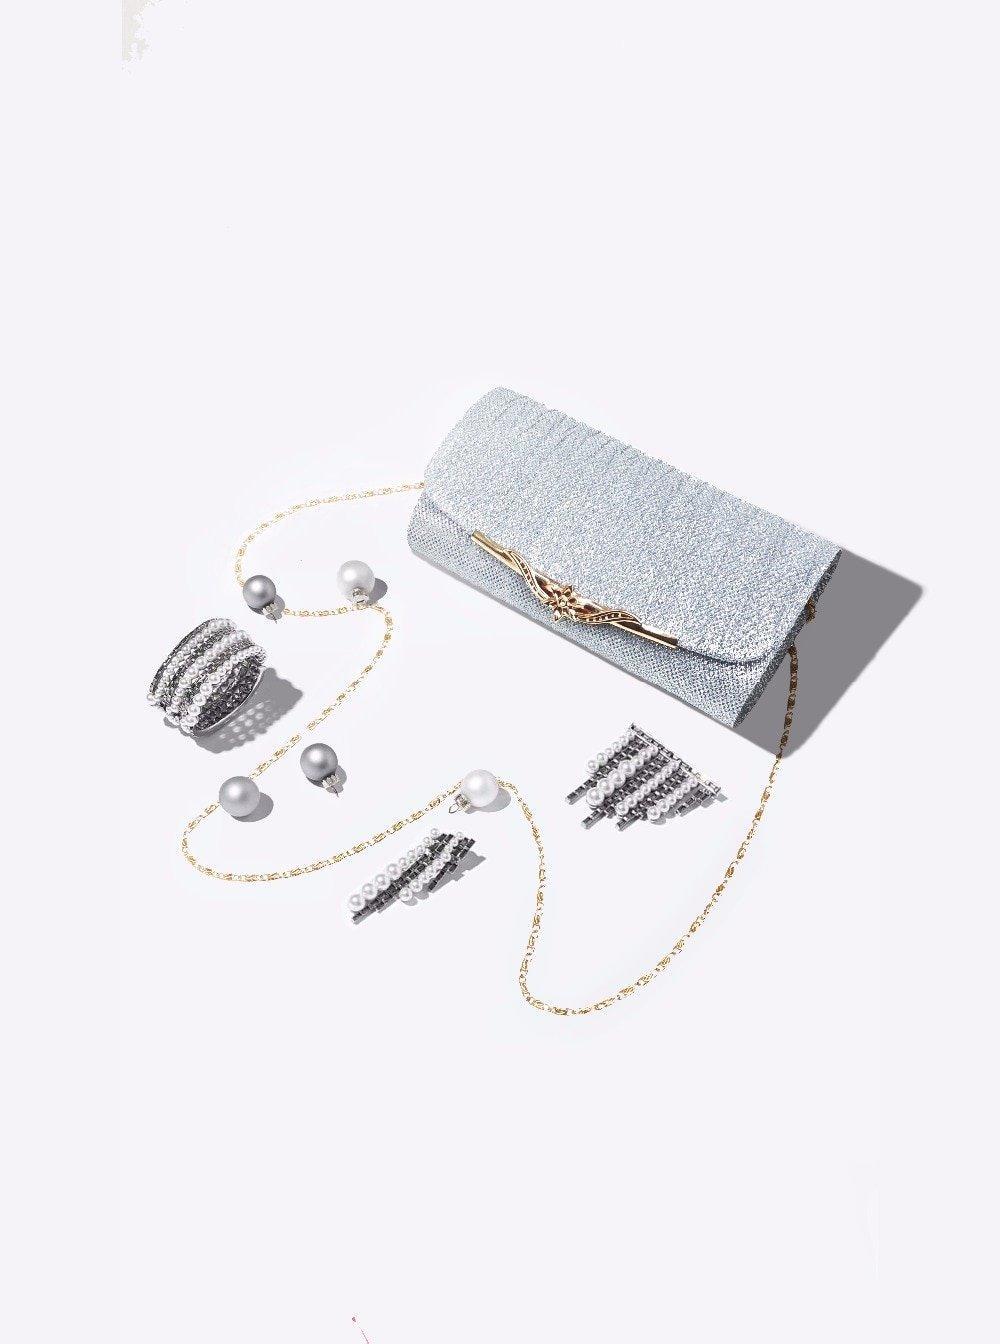 Fashion Women Evening Bag Brand Party Banquet Glitter Bag For Ladies Wedding Clutches Handbag Shoulder Bag Chain Bolsas Mujer